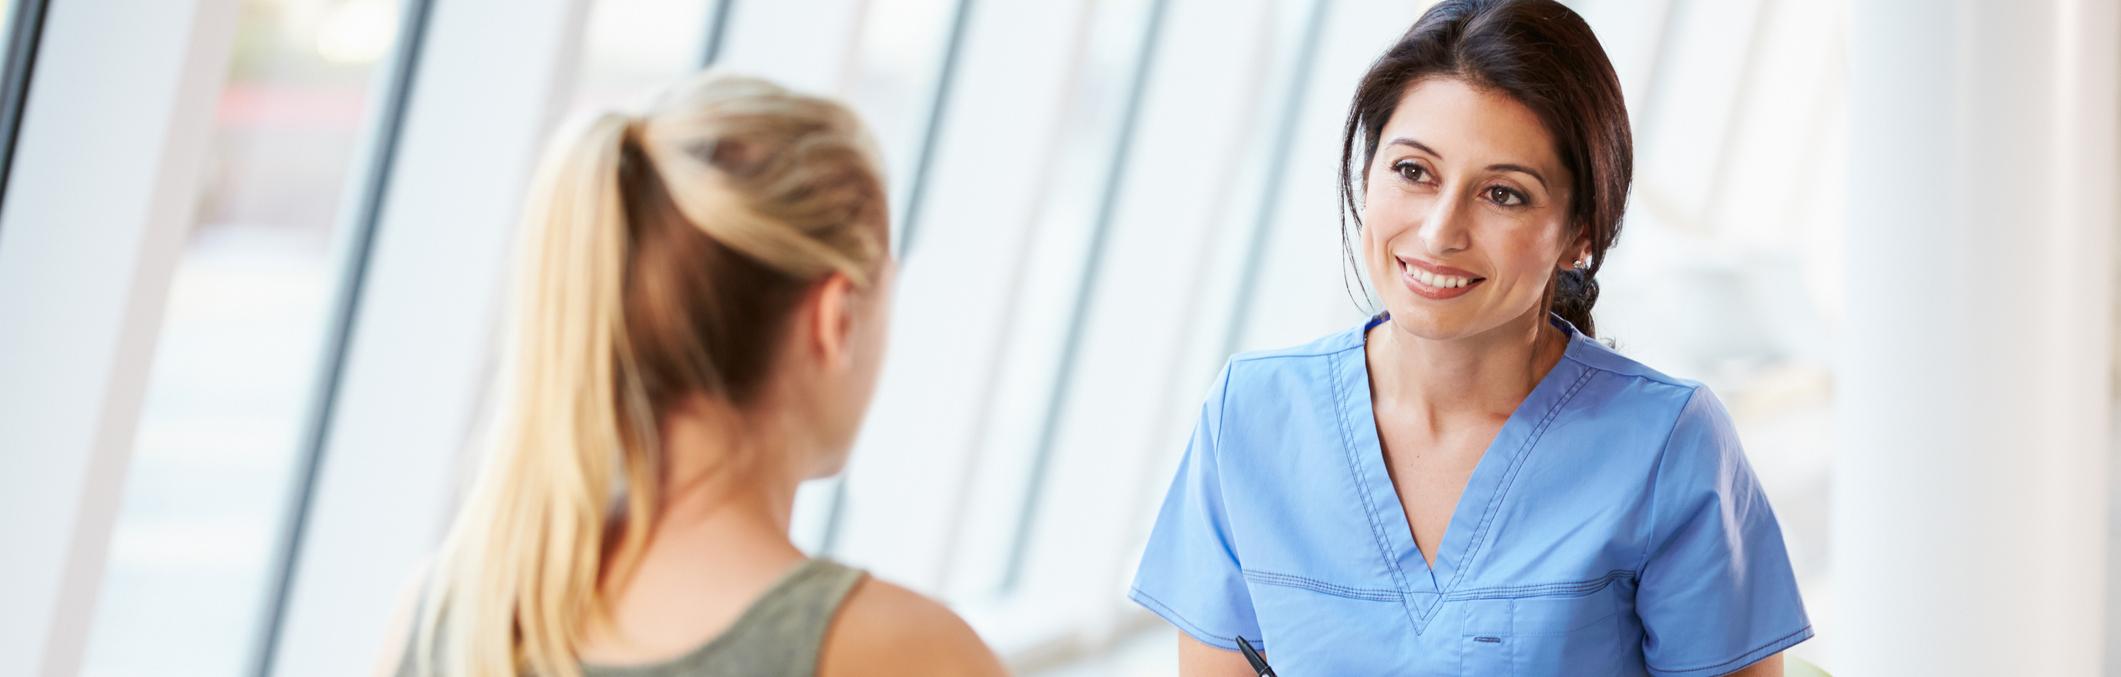 Nurse conversing with patient